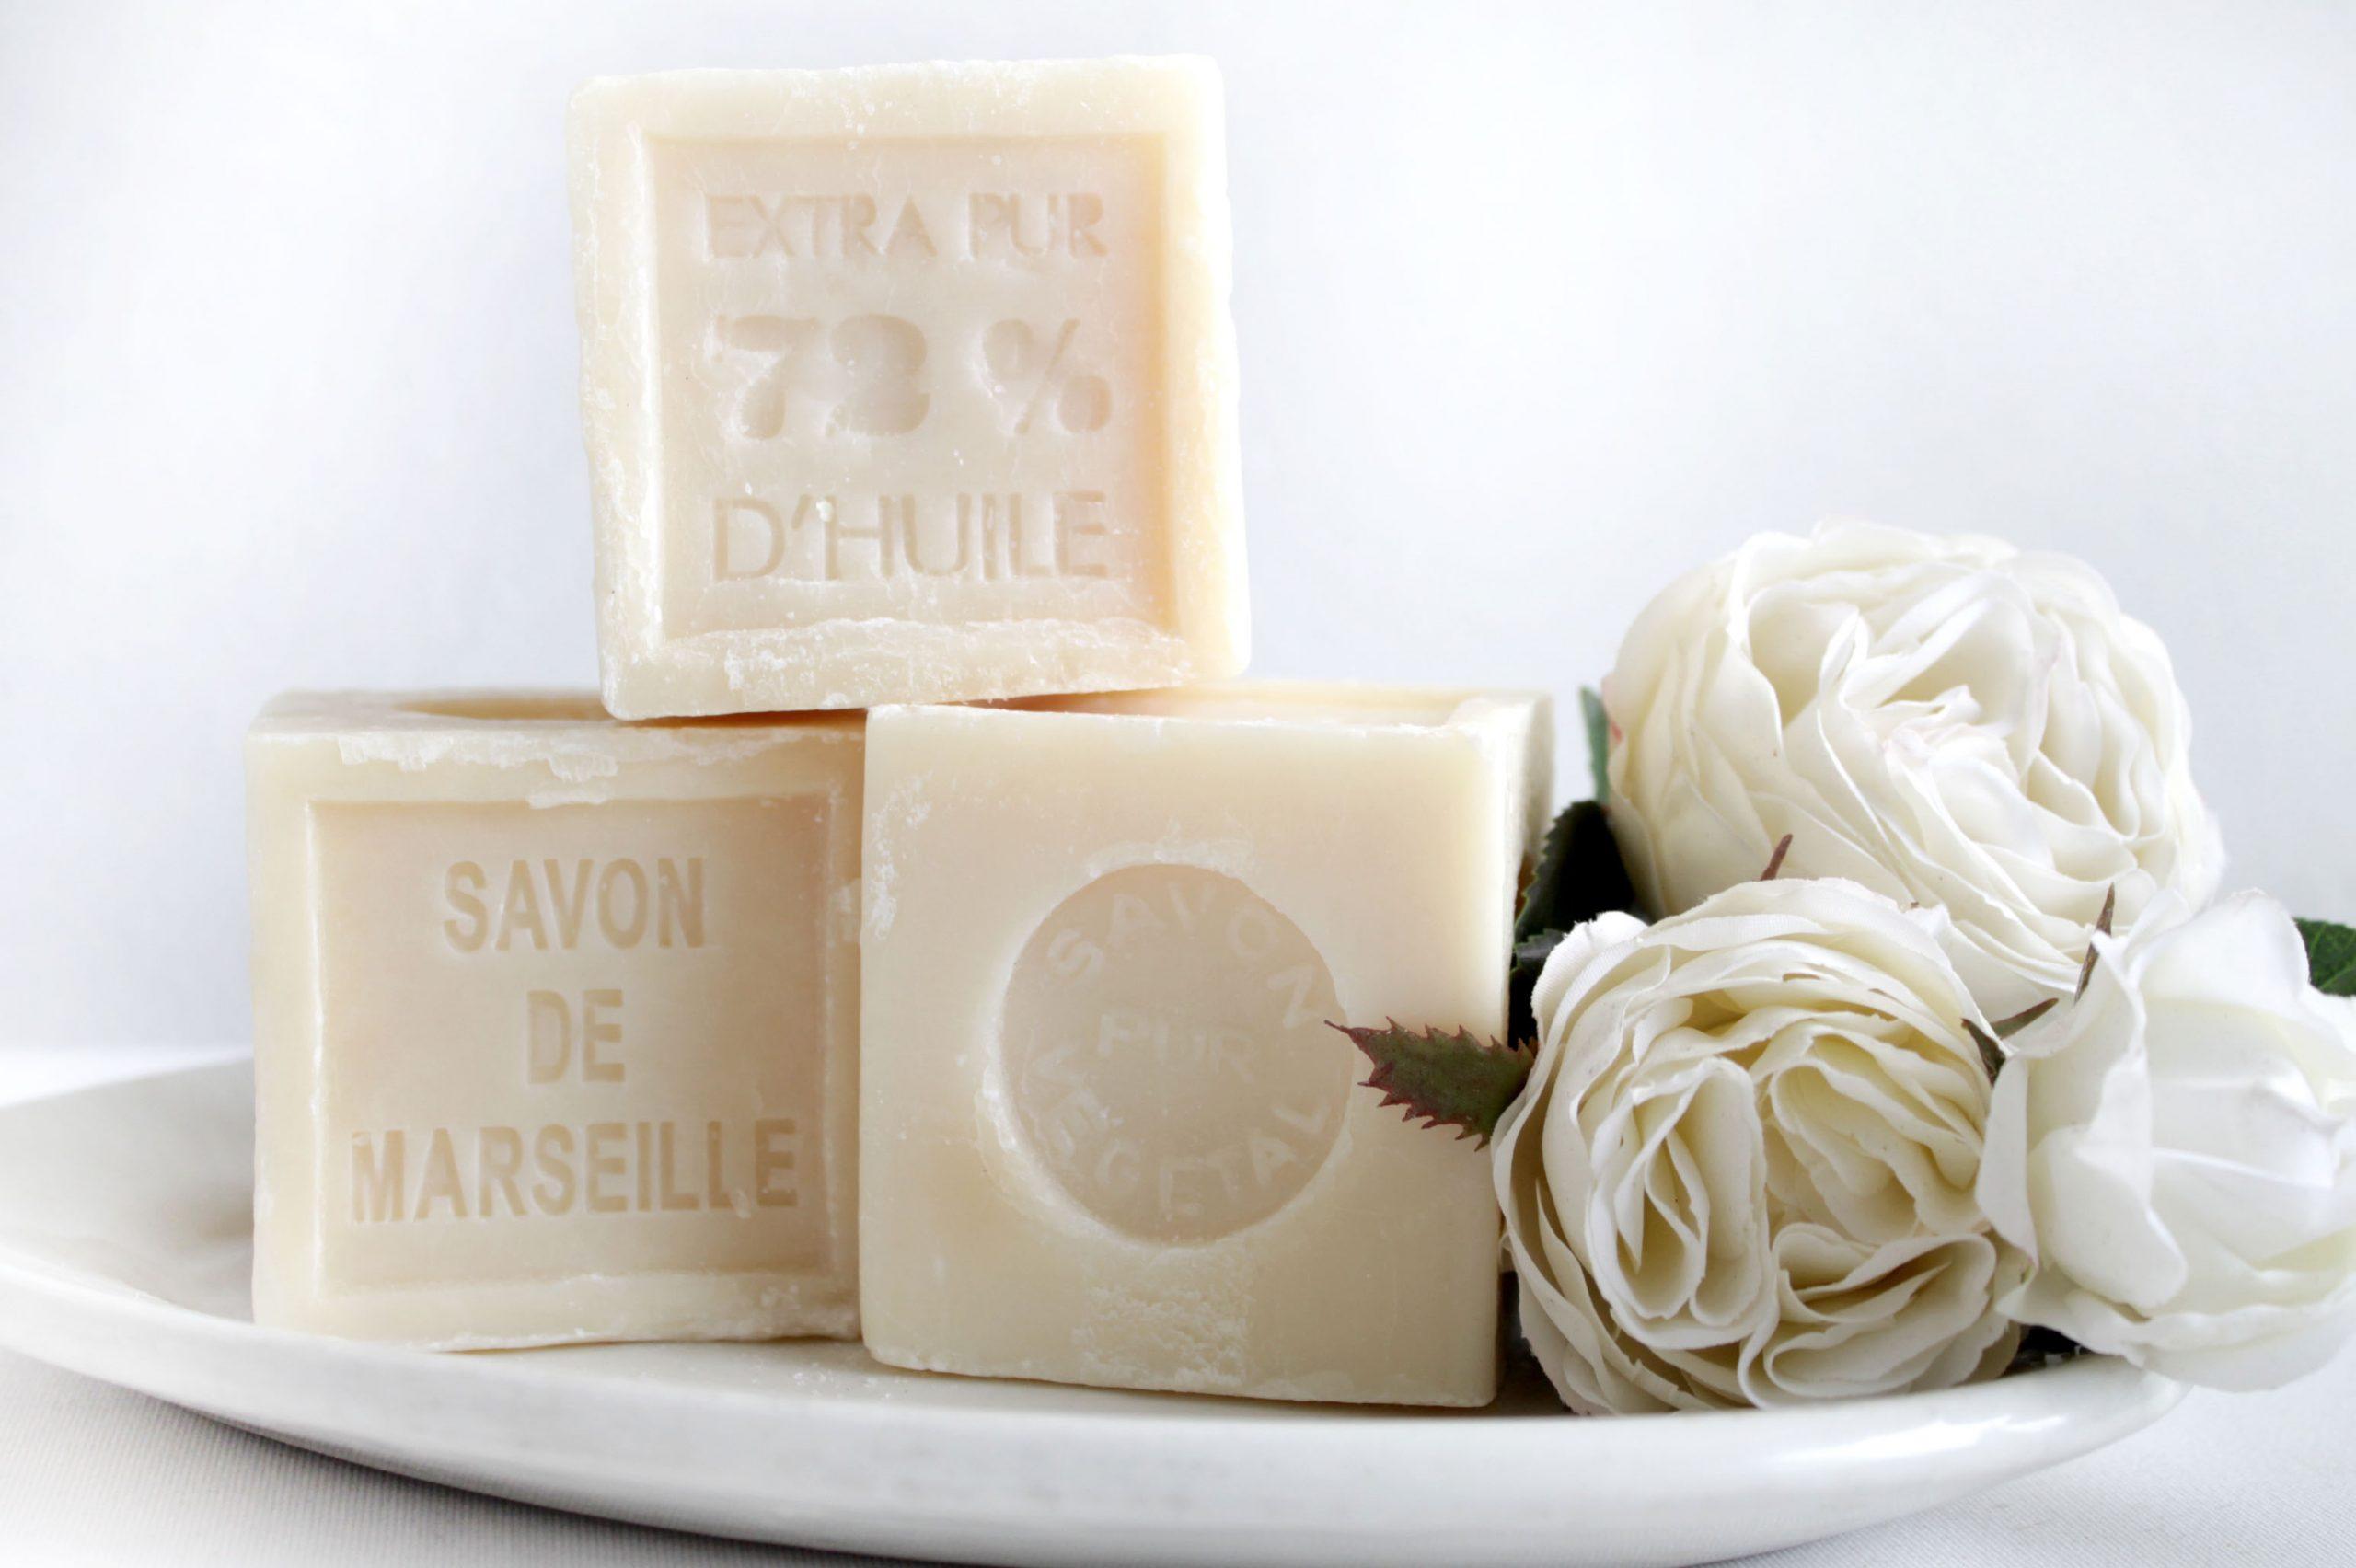 OriginalSavon de Marseille Olive Oil Soap Bar